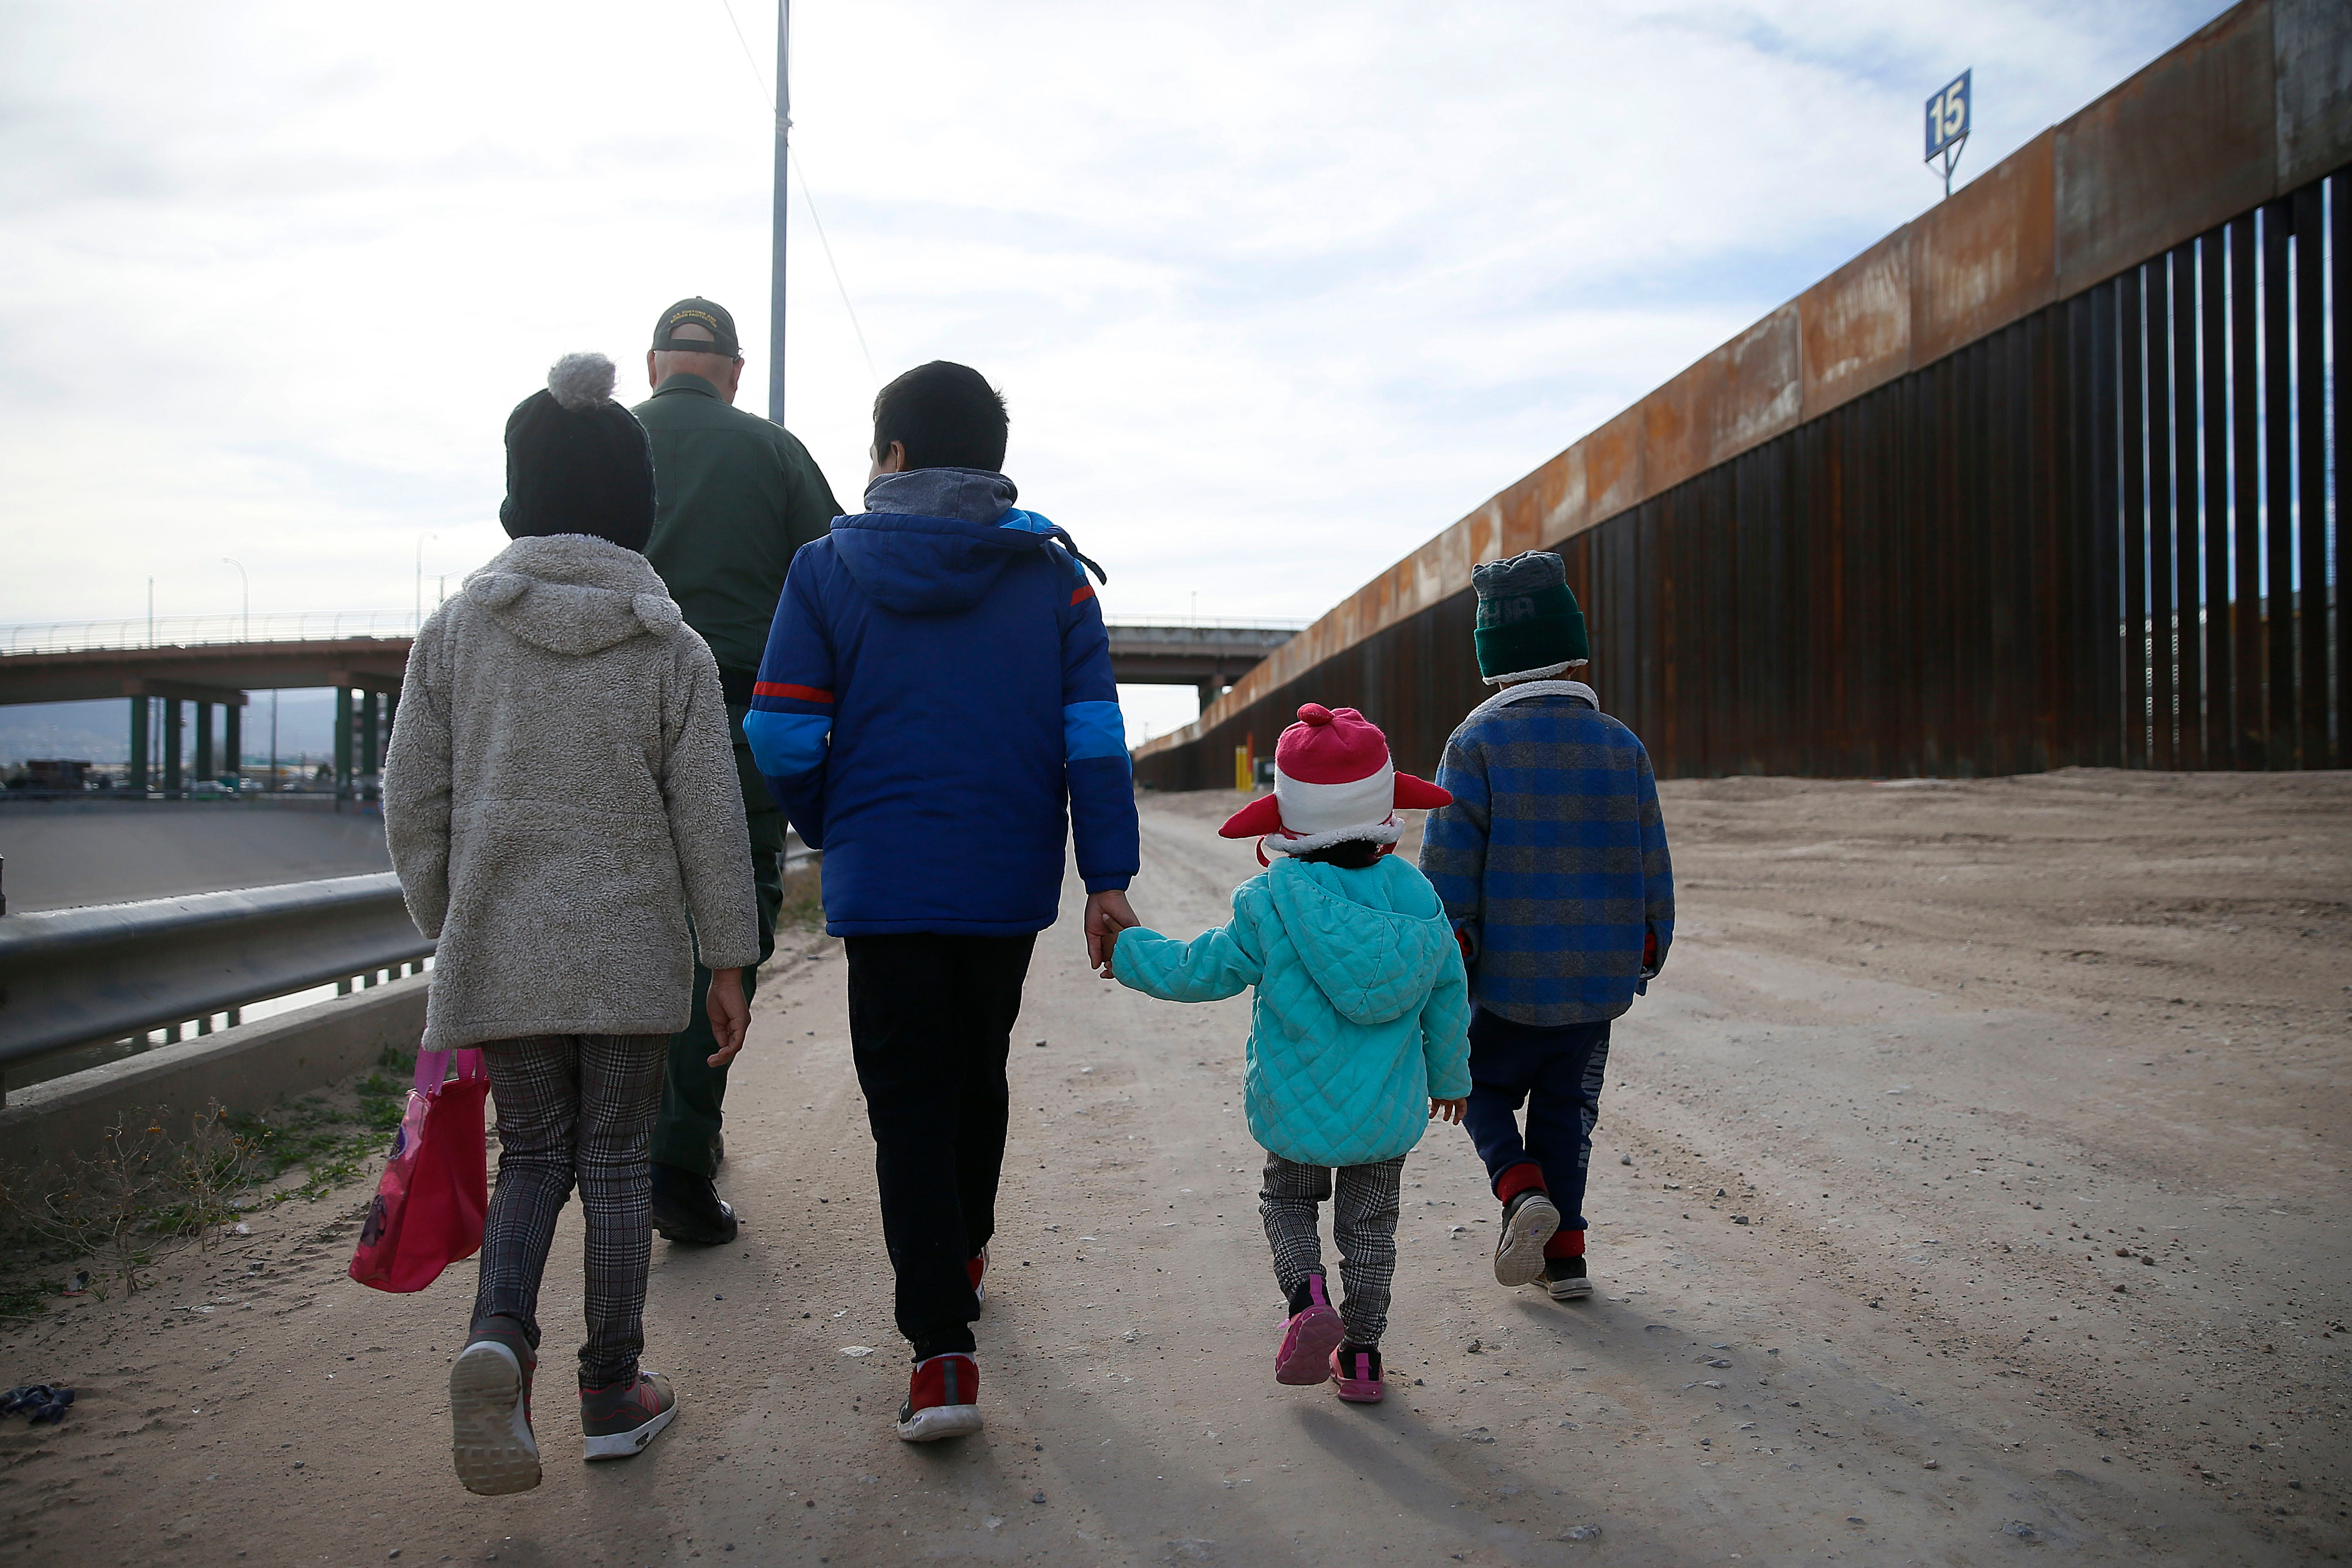 Coronavirus: 3 migrant children in US custody in New York test positive